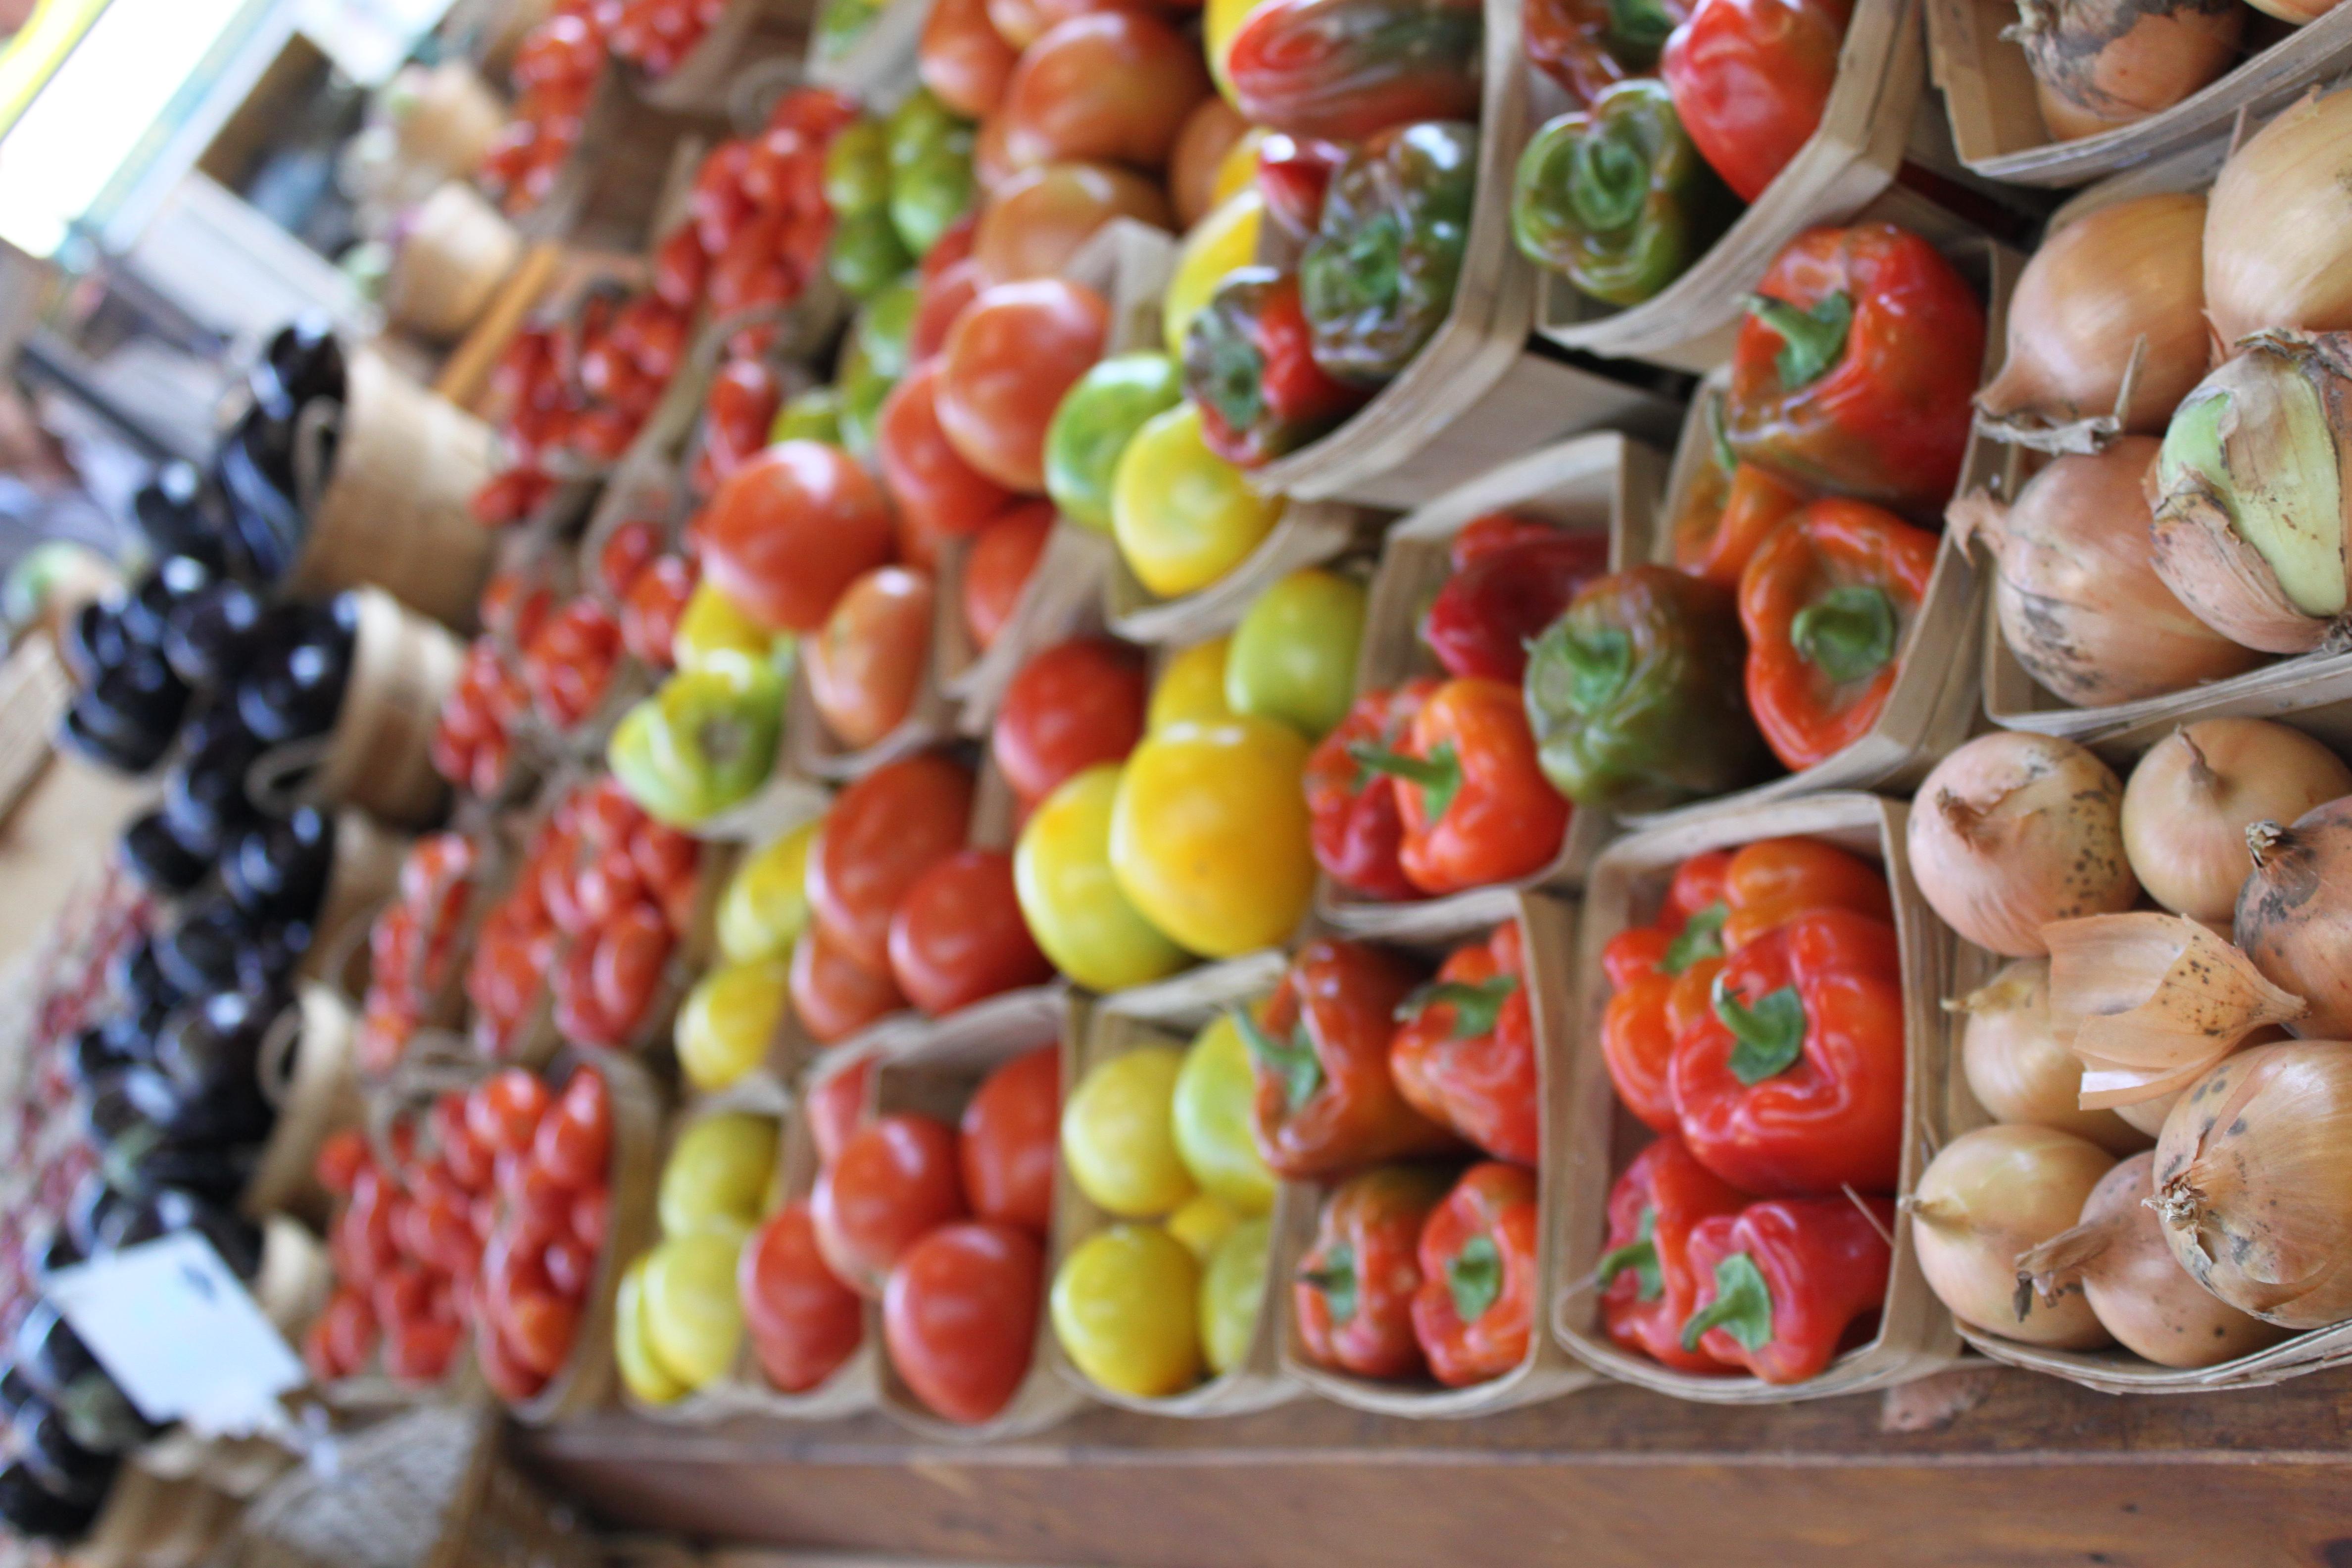 Market Food Montreal Green Line